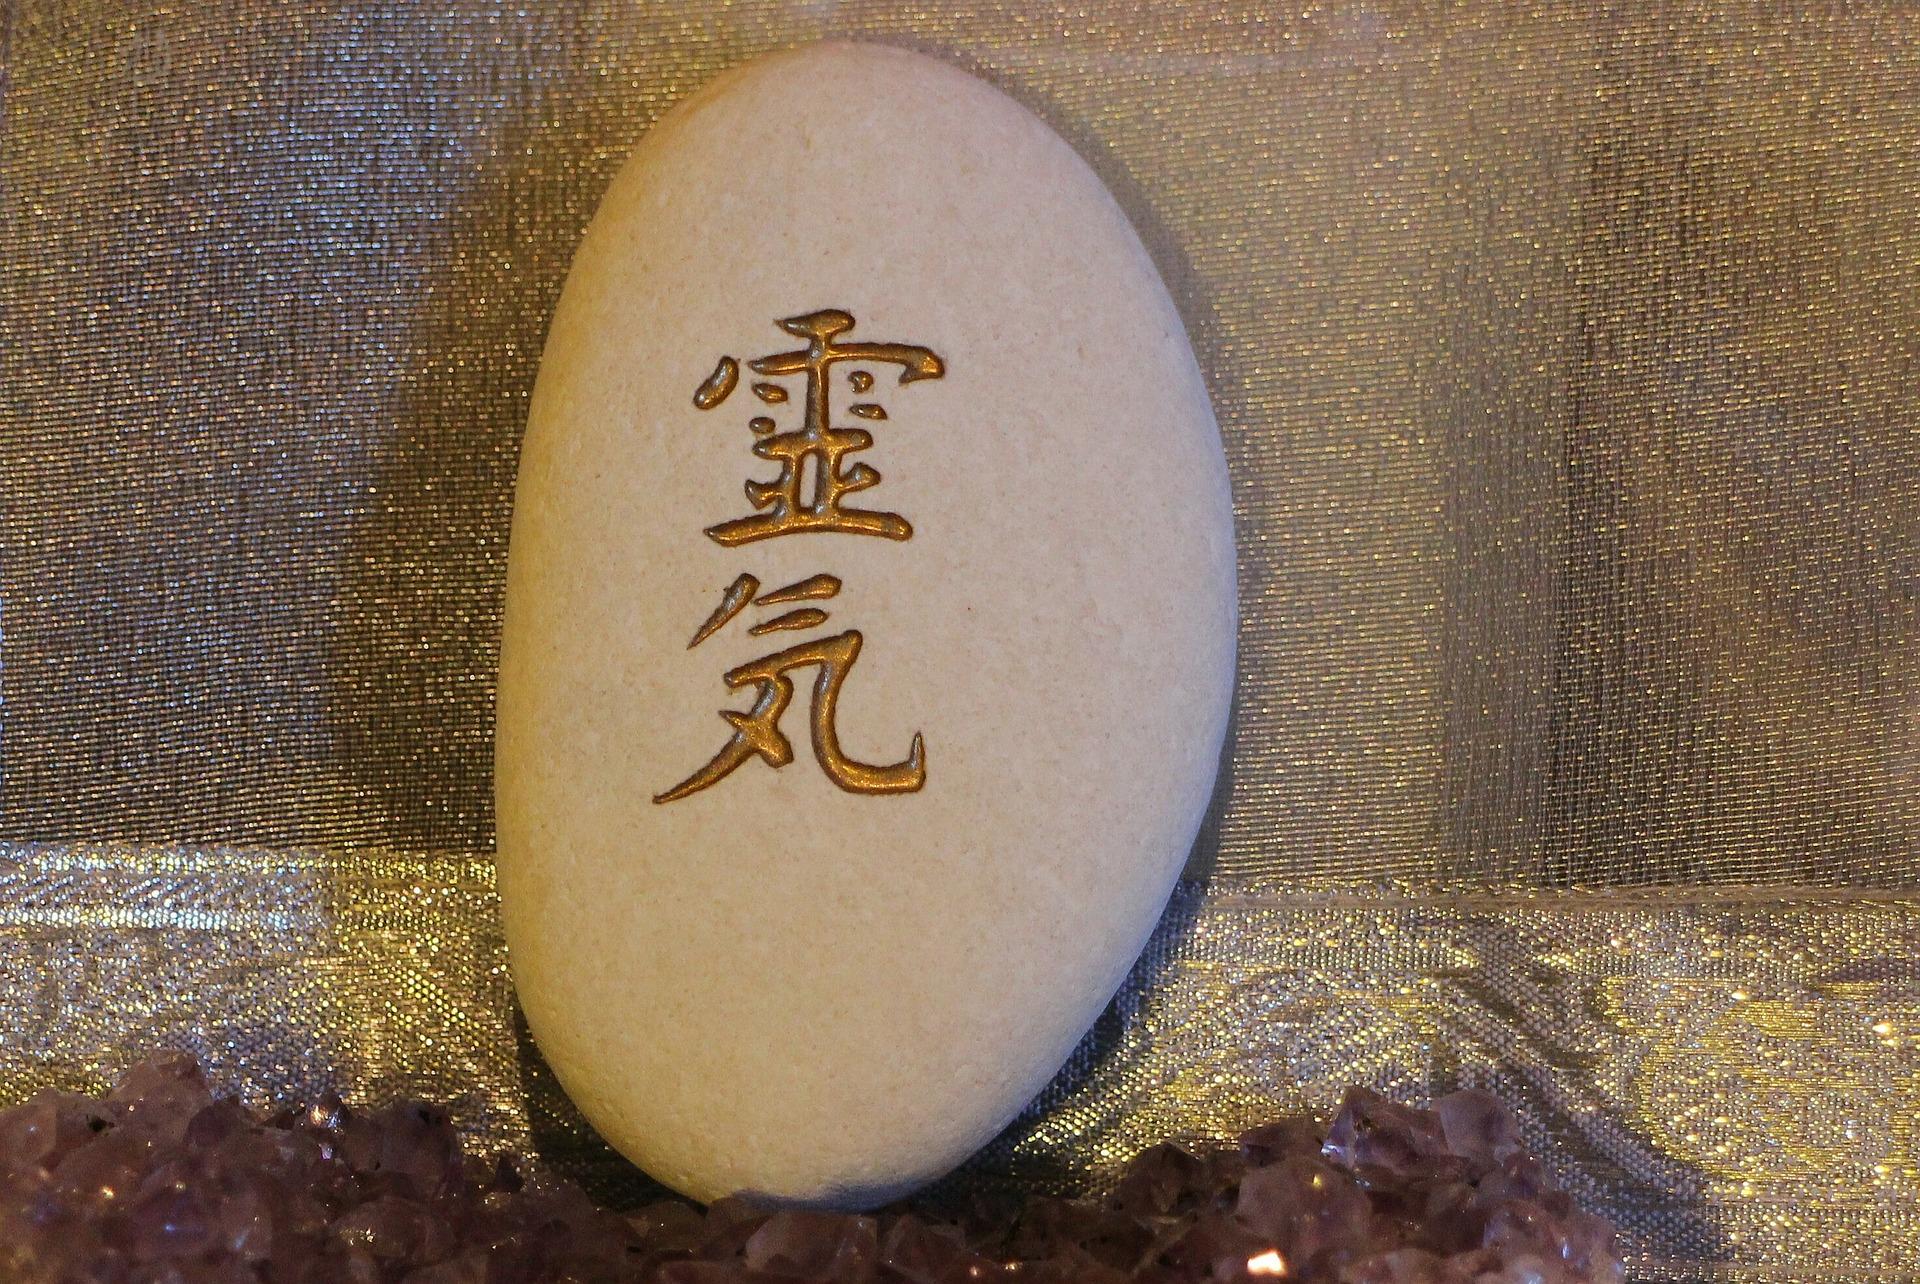 Image Reiki Japanese characters on stone